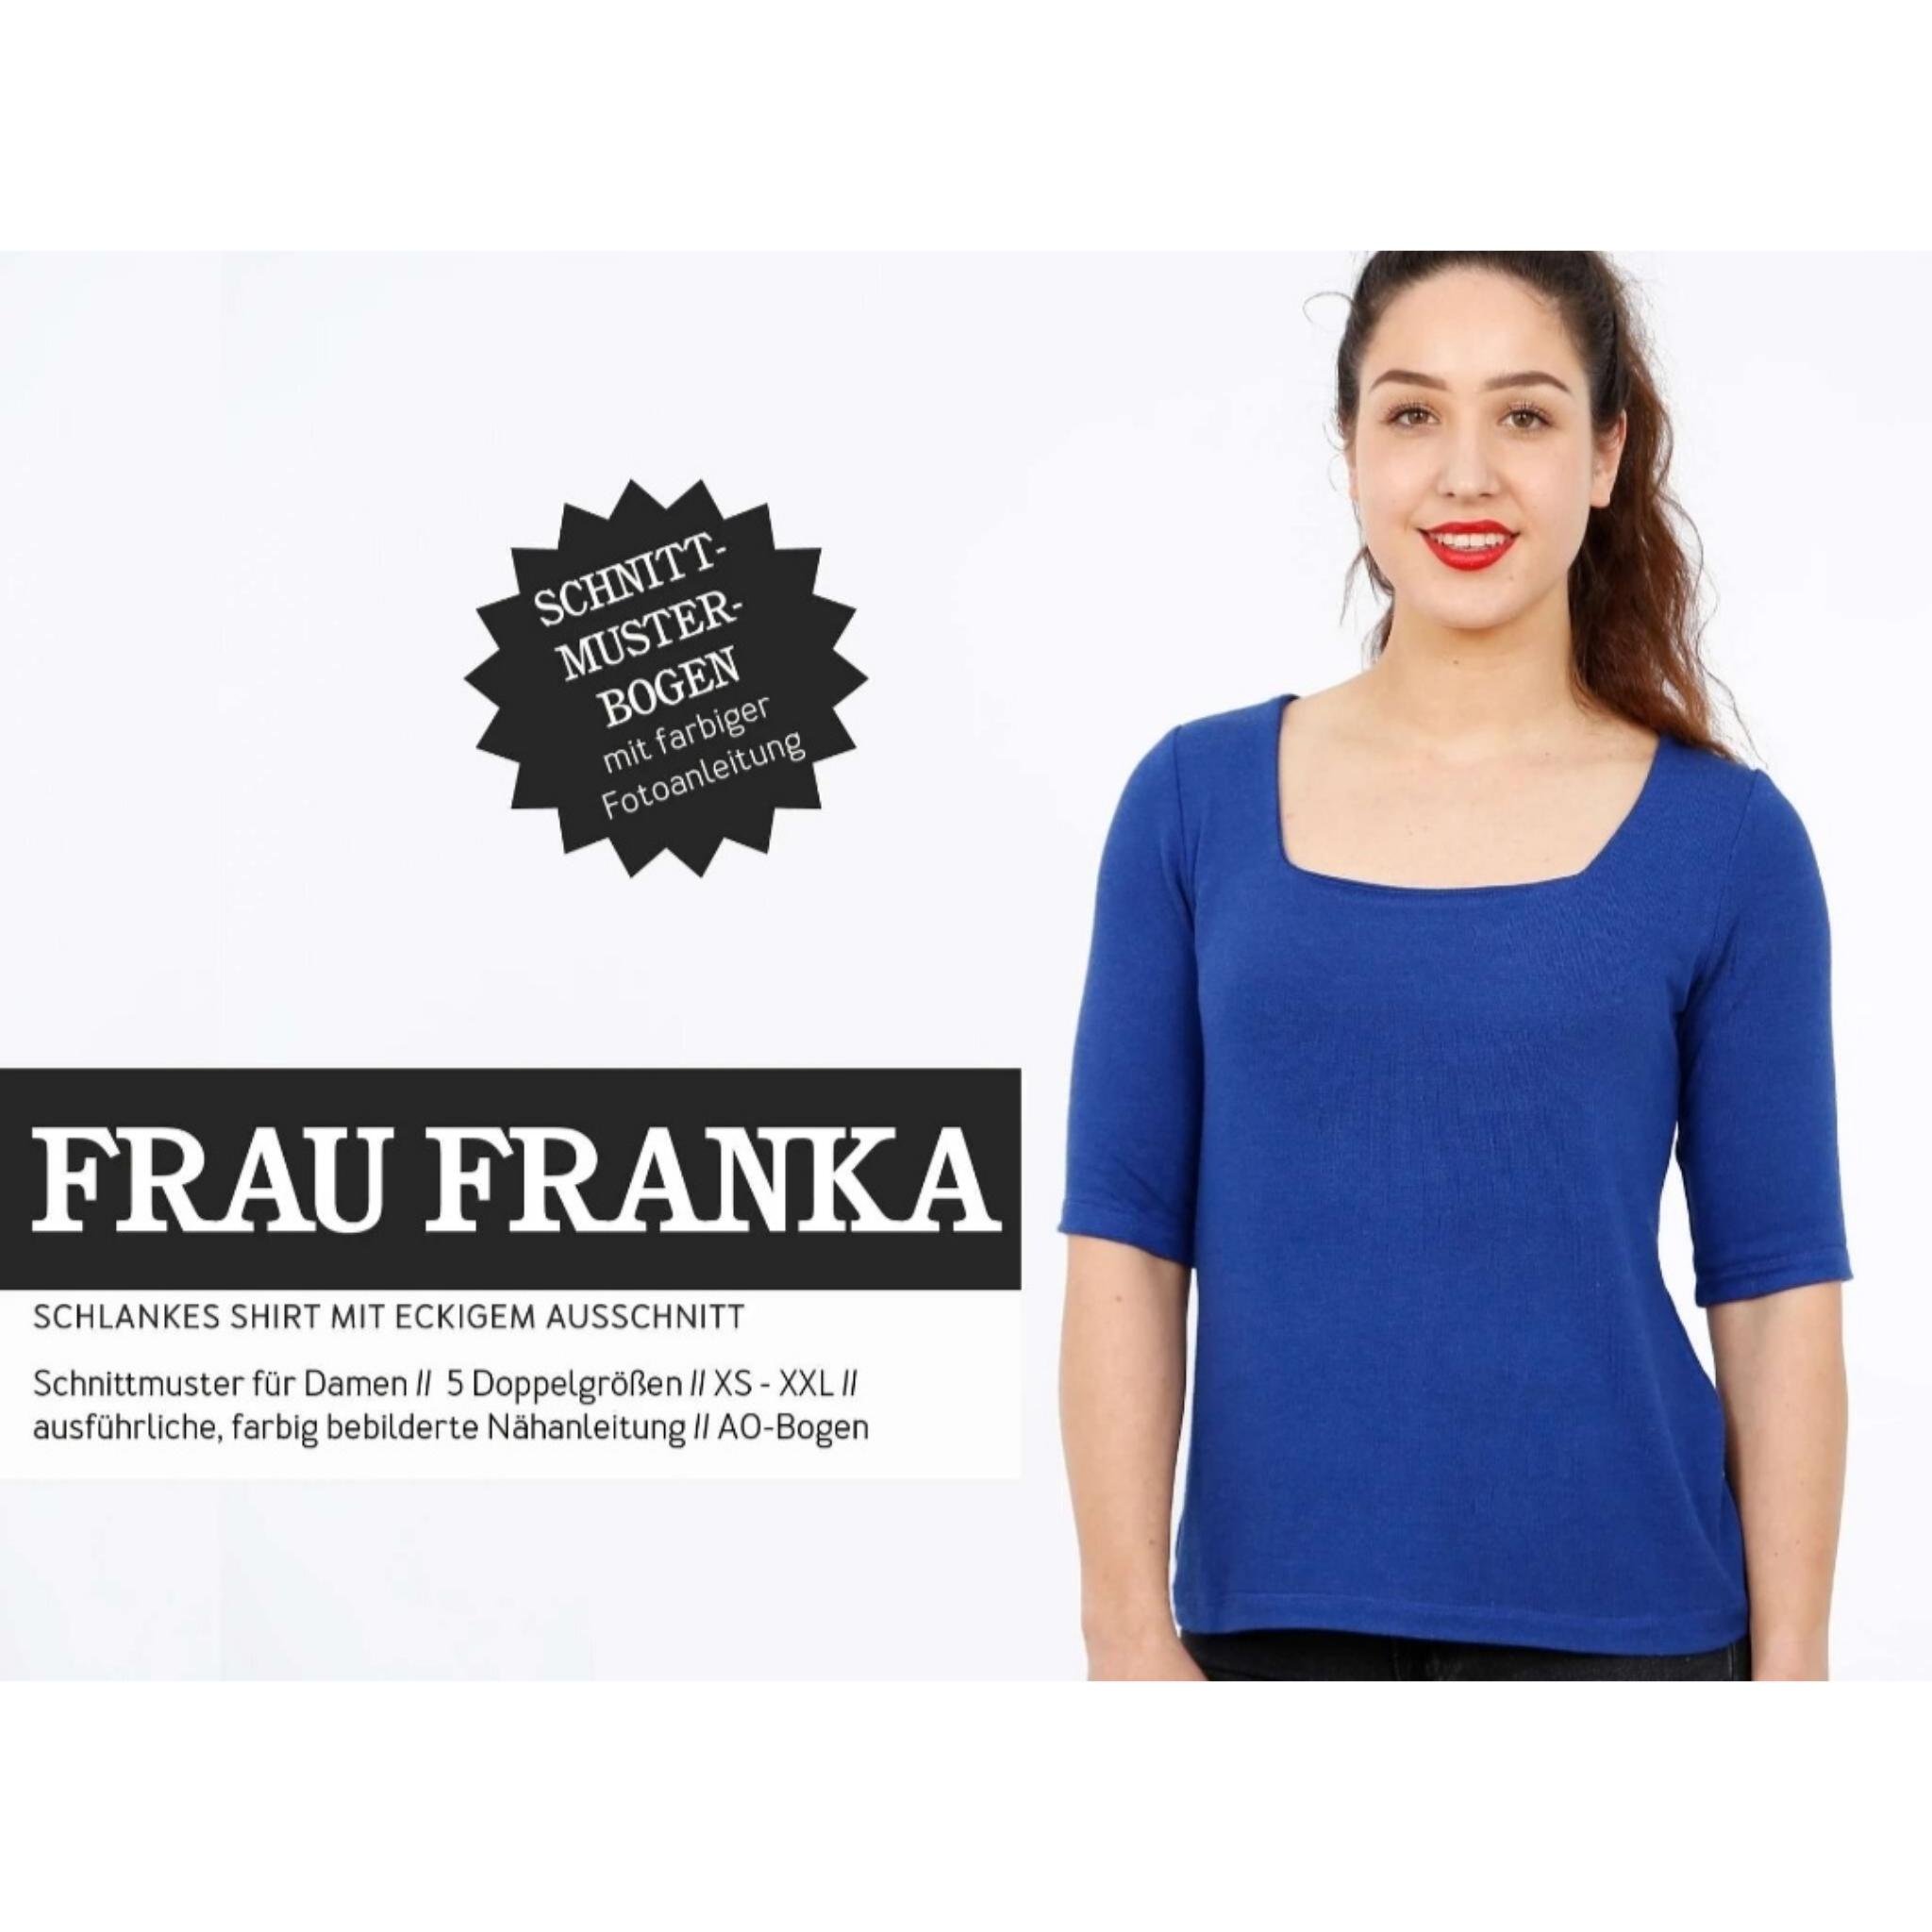 FRAU FRANKA schnittmuster studio schnittreif